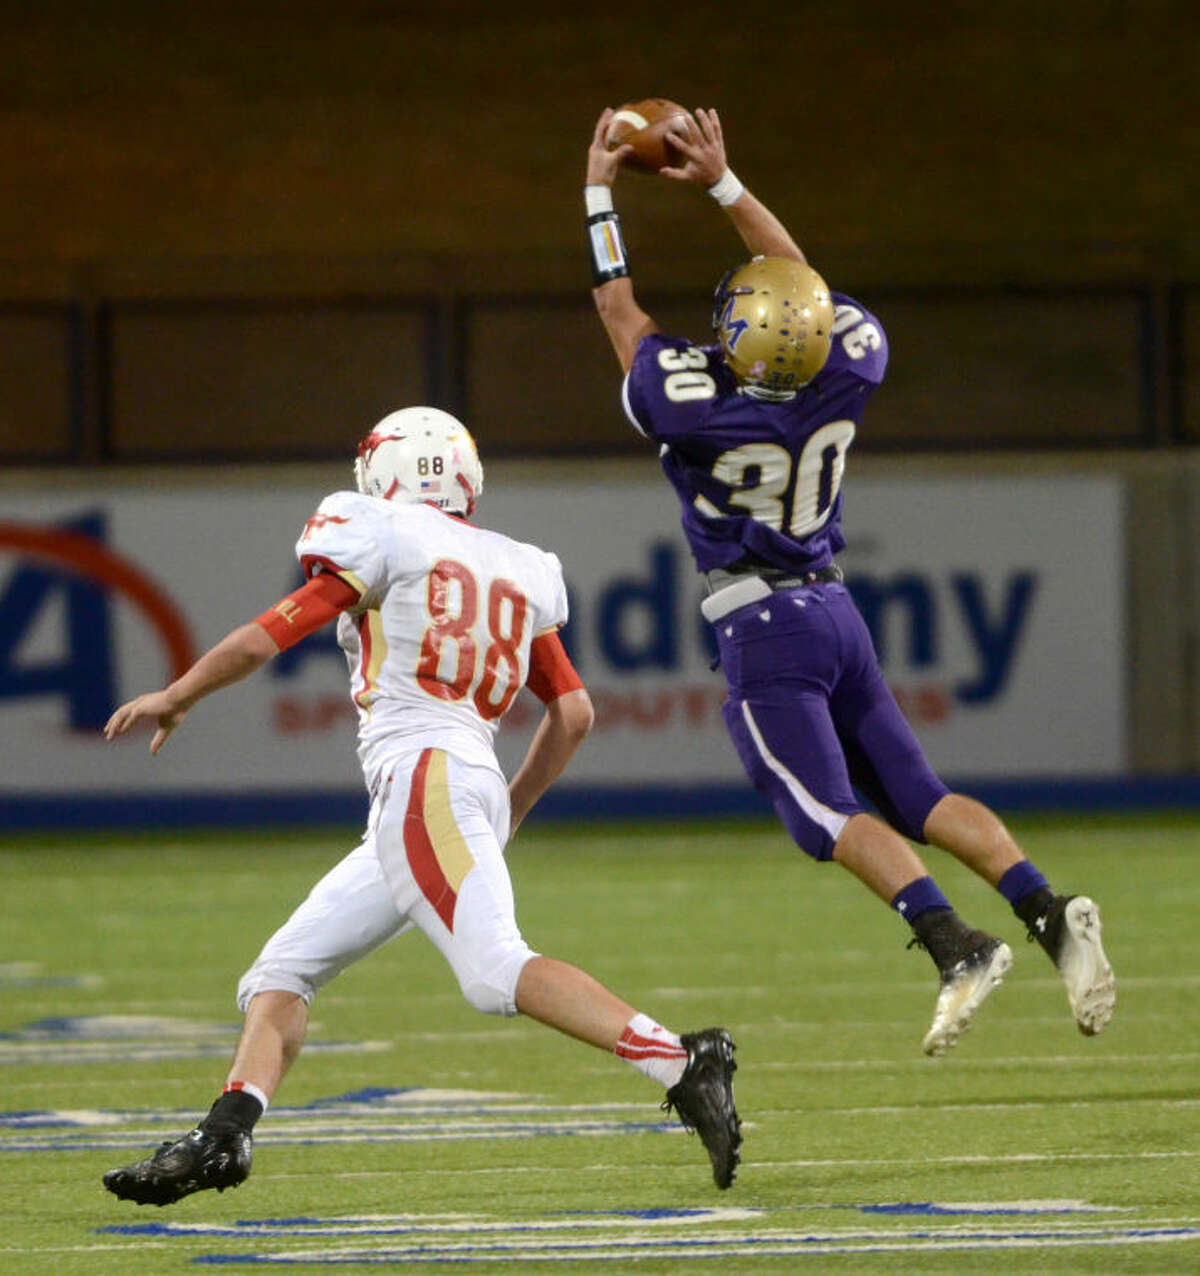 Midland High's Britt Boler makes an interception against Lubbock Coronado on Friday at Grande Communications Stadium. James Durbin/Reporter-Telegram